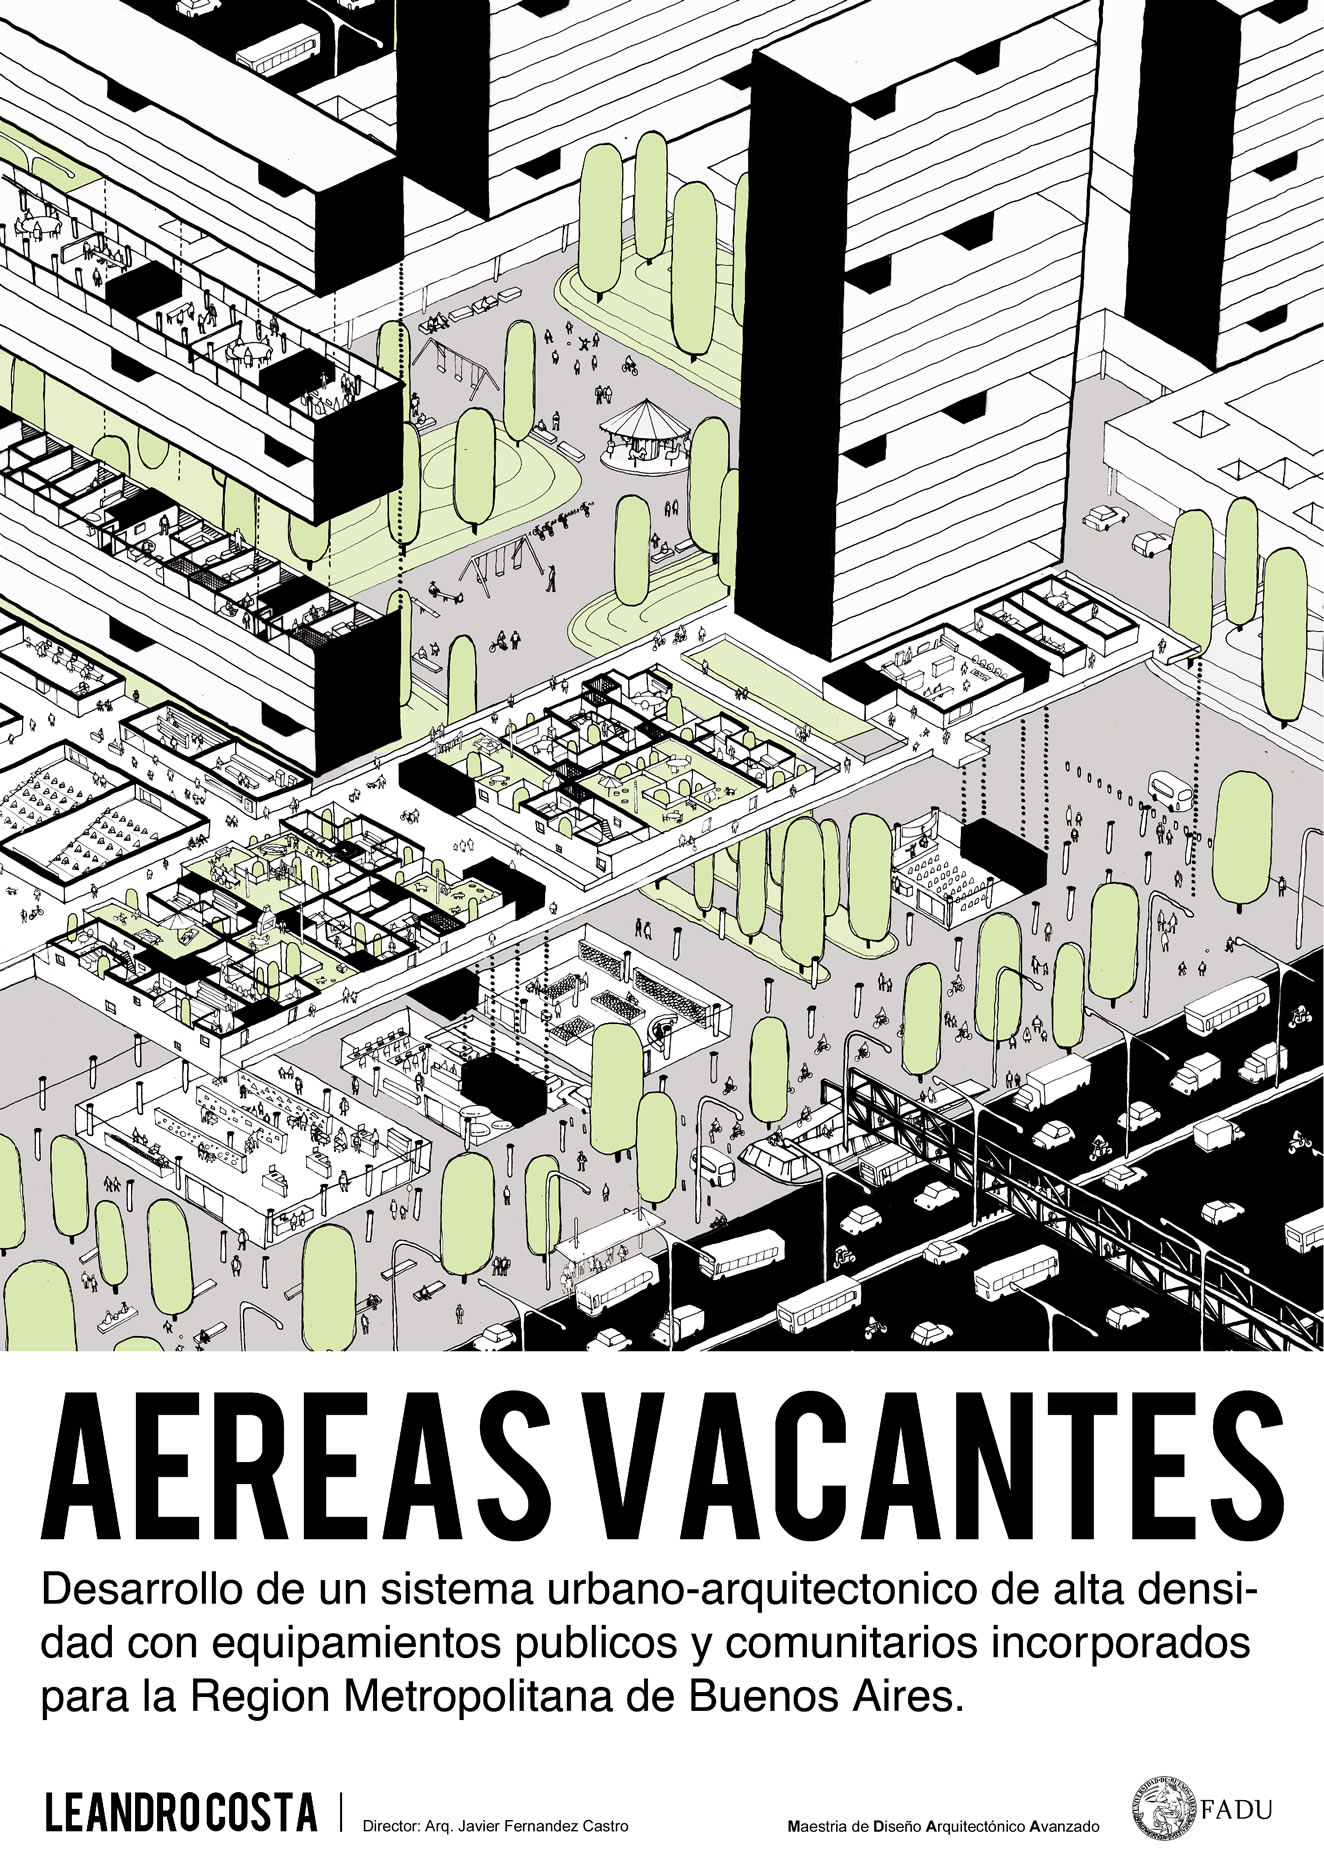 01 Tapa poster A. Vacantes